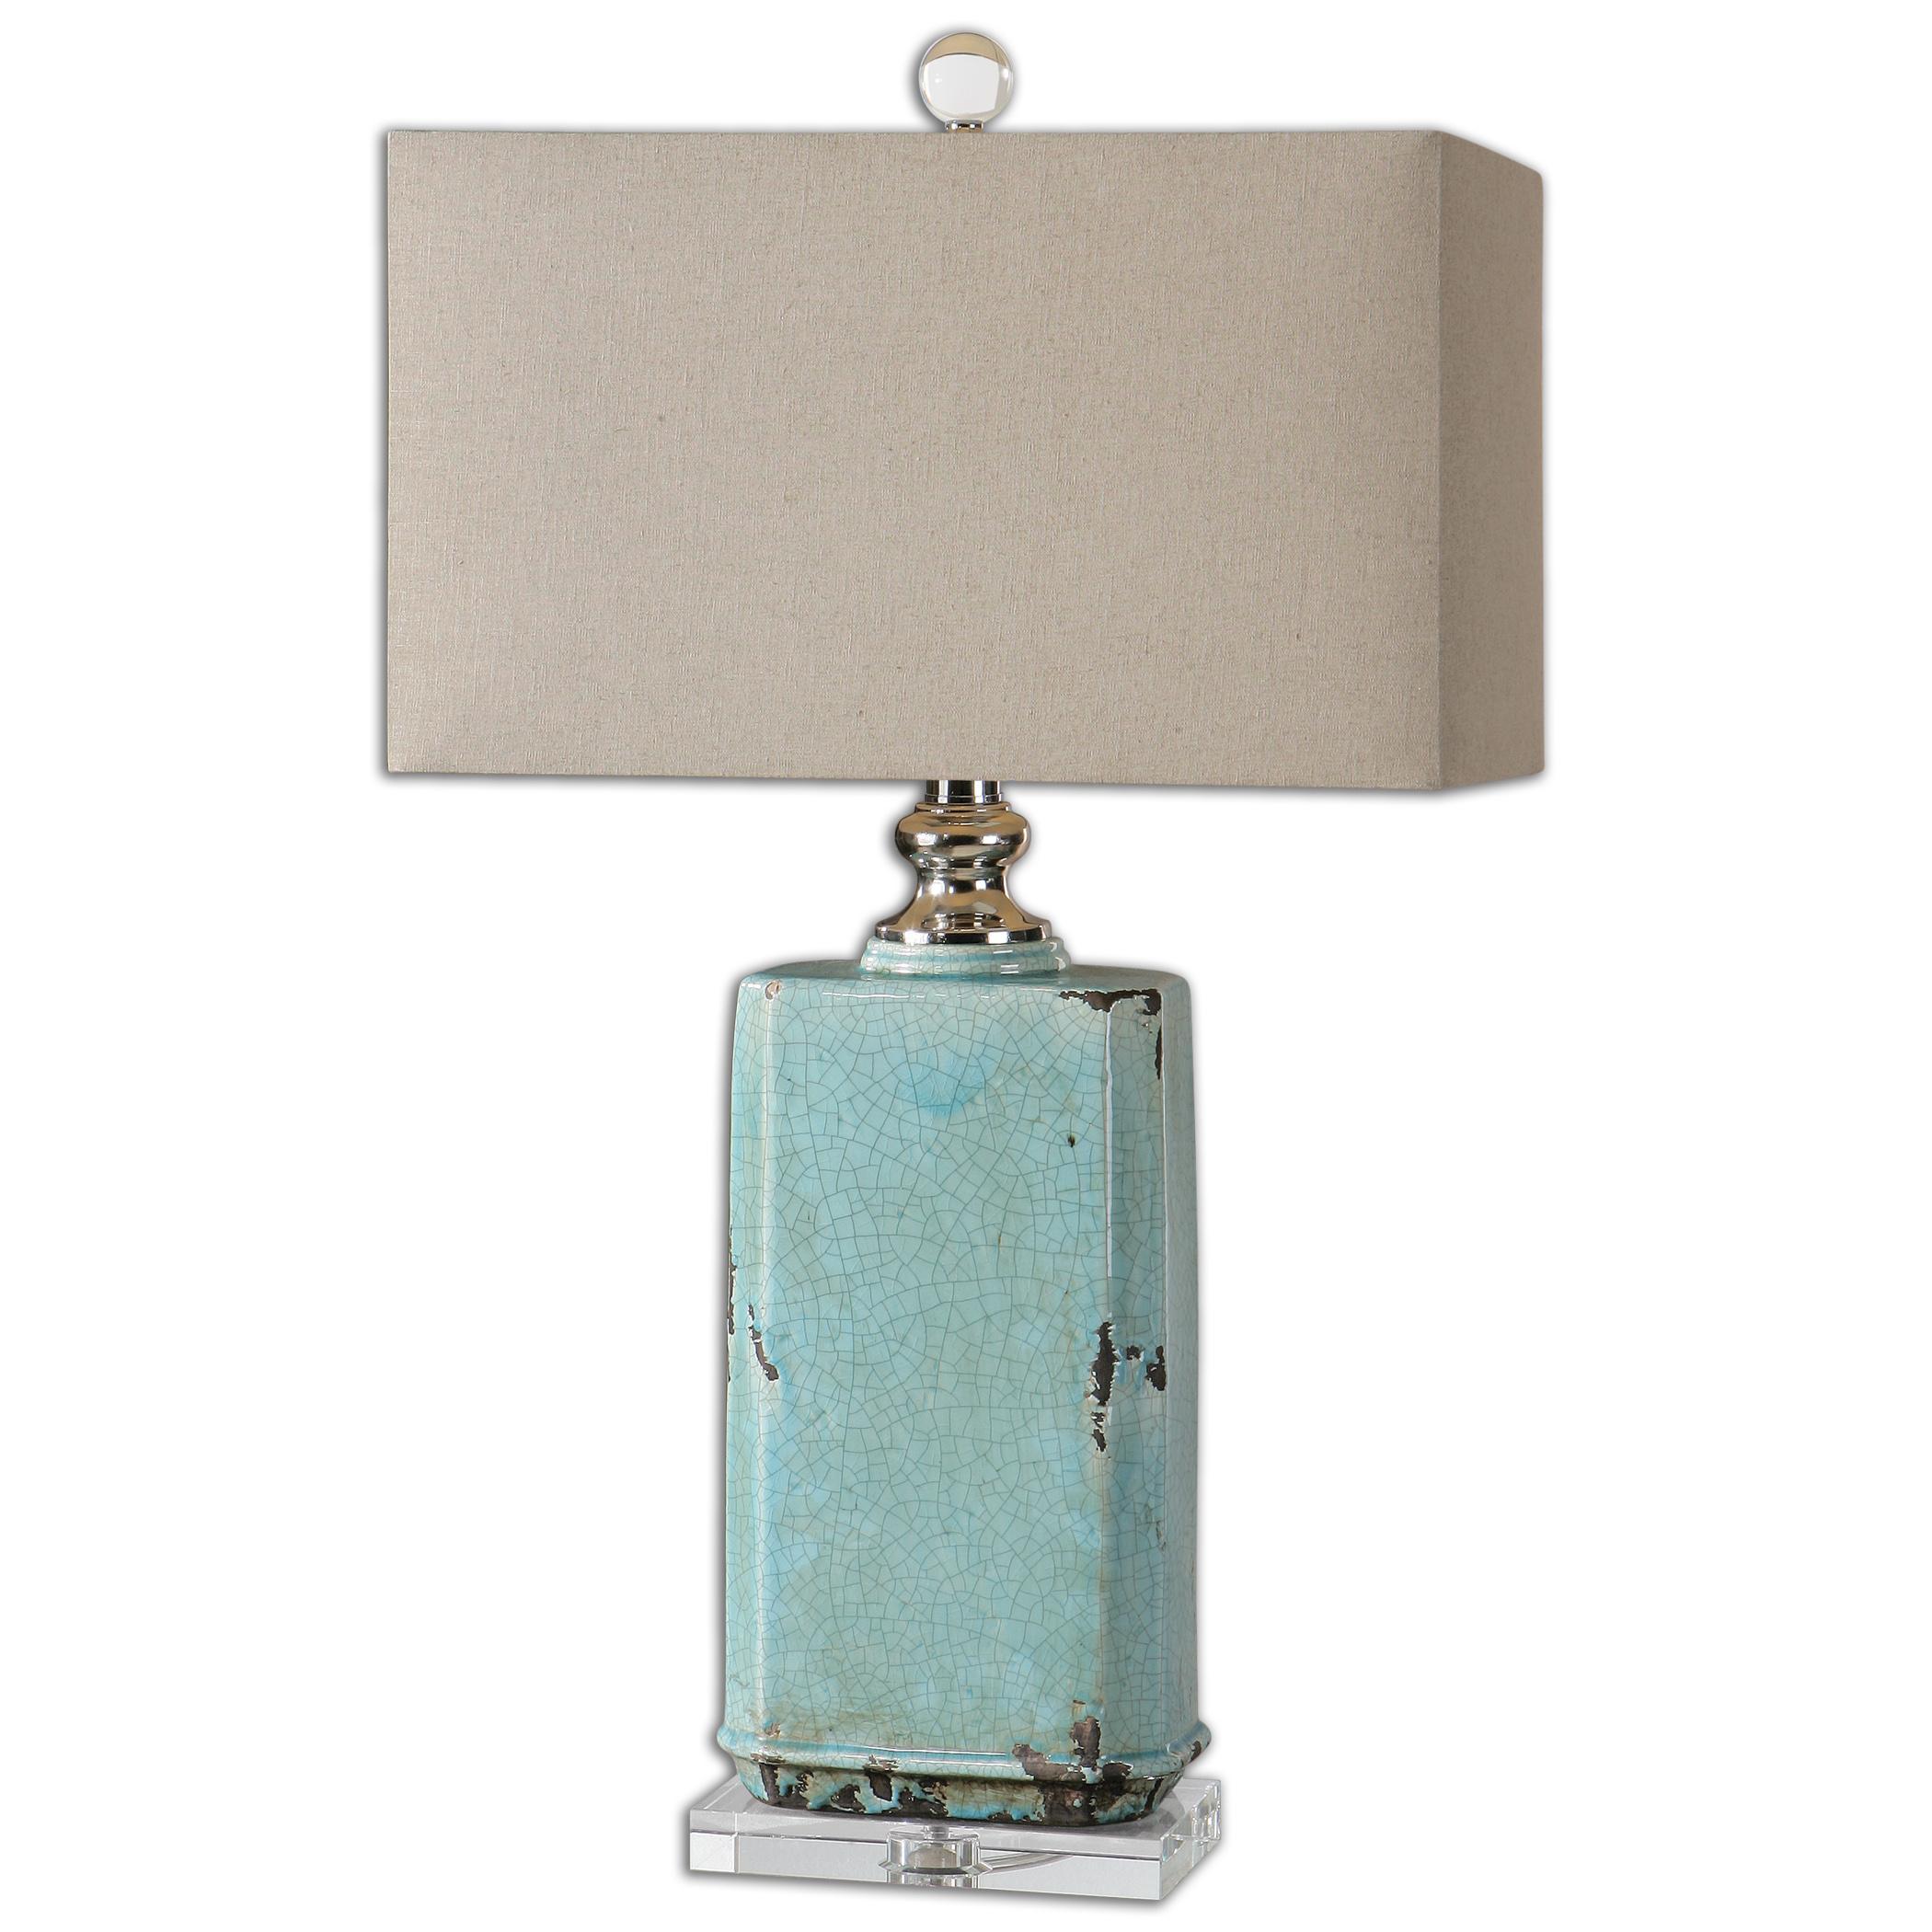 Adalbern Blue Crackle Lamp